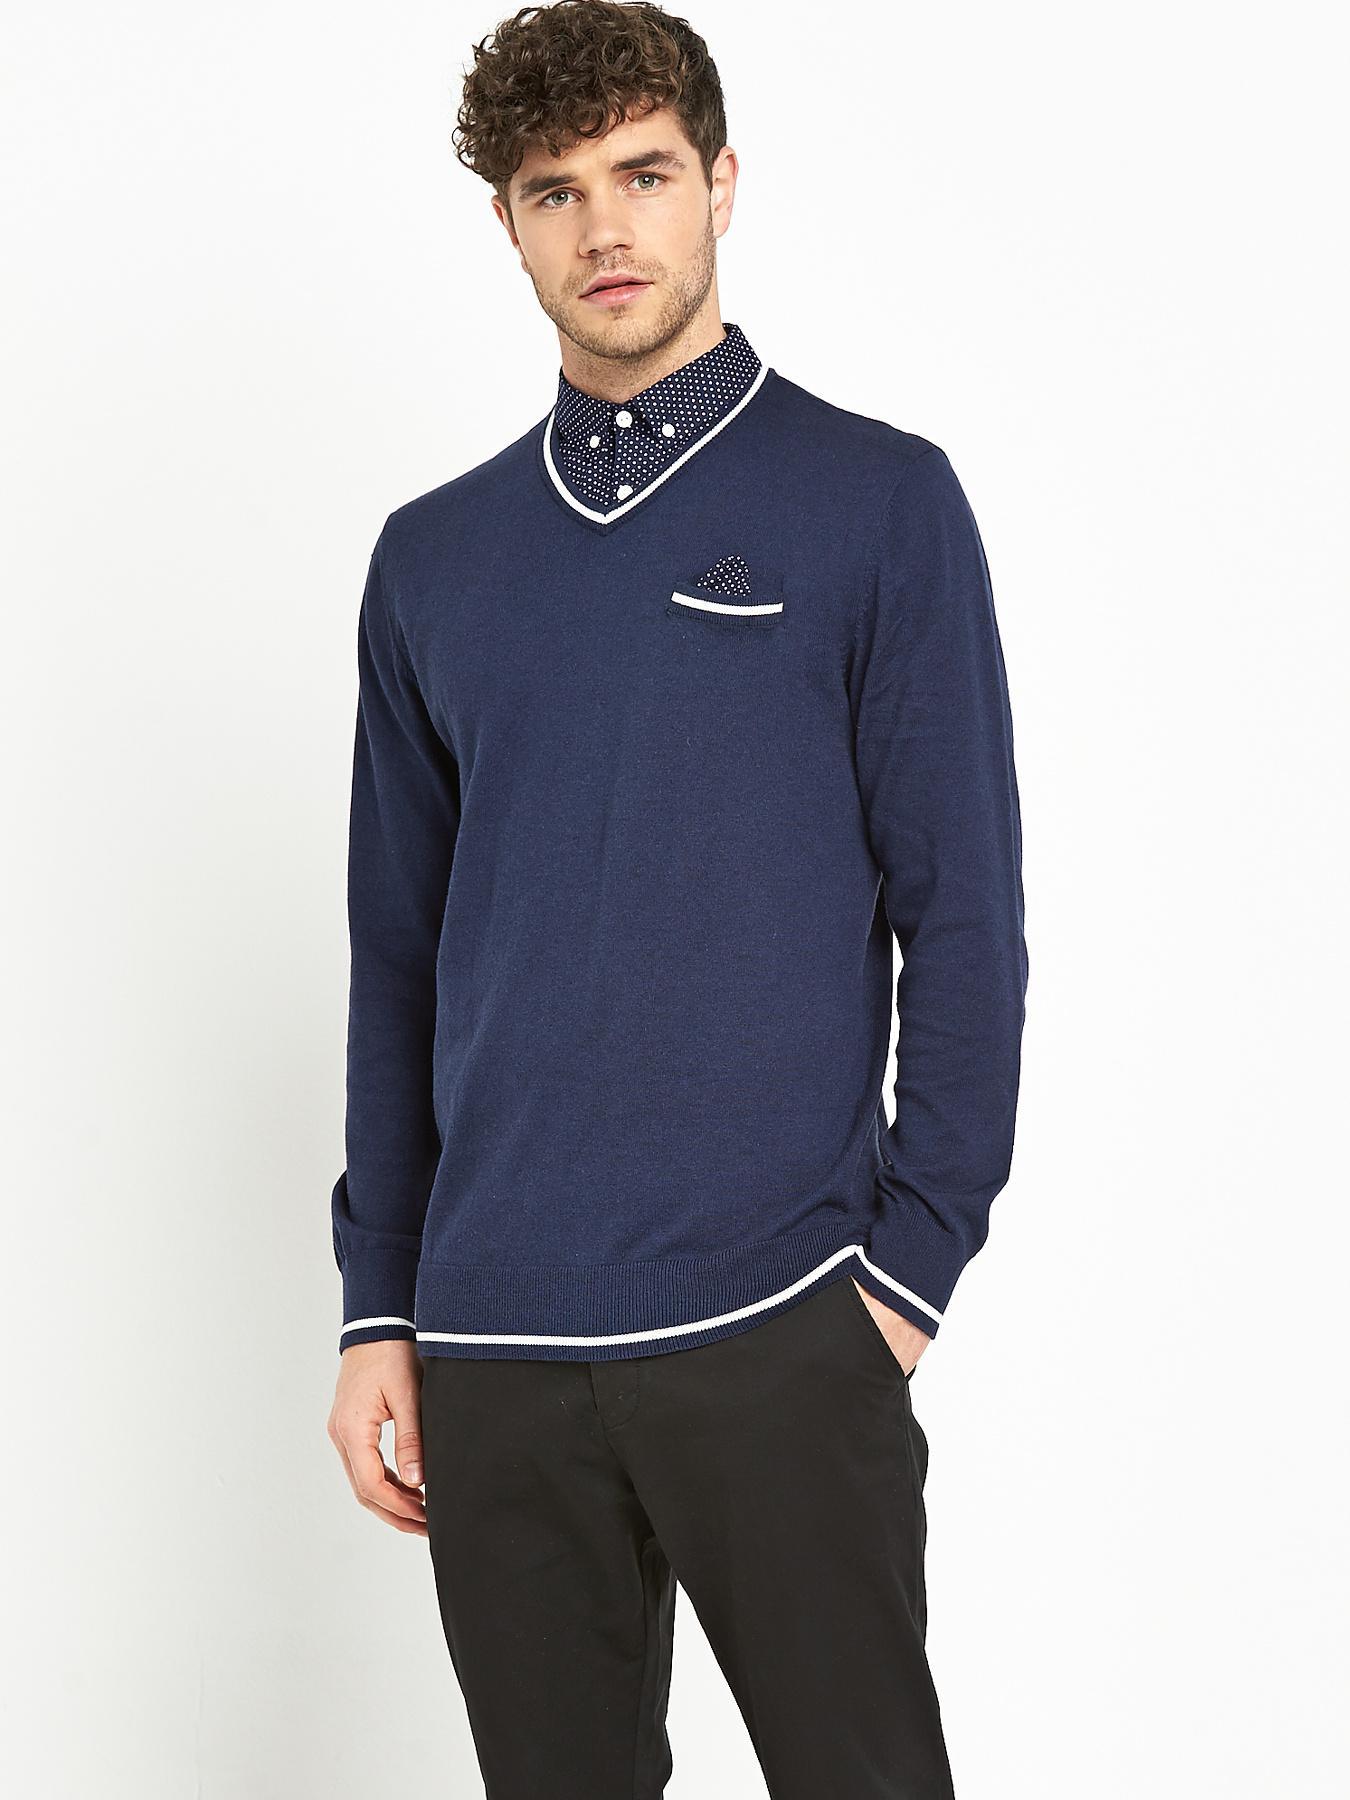 Goodsouls Mens Mock Shirt - Navy, Navy